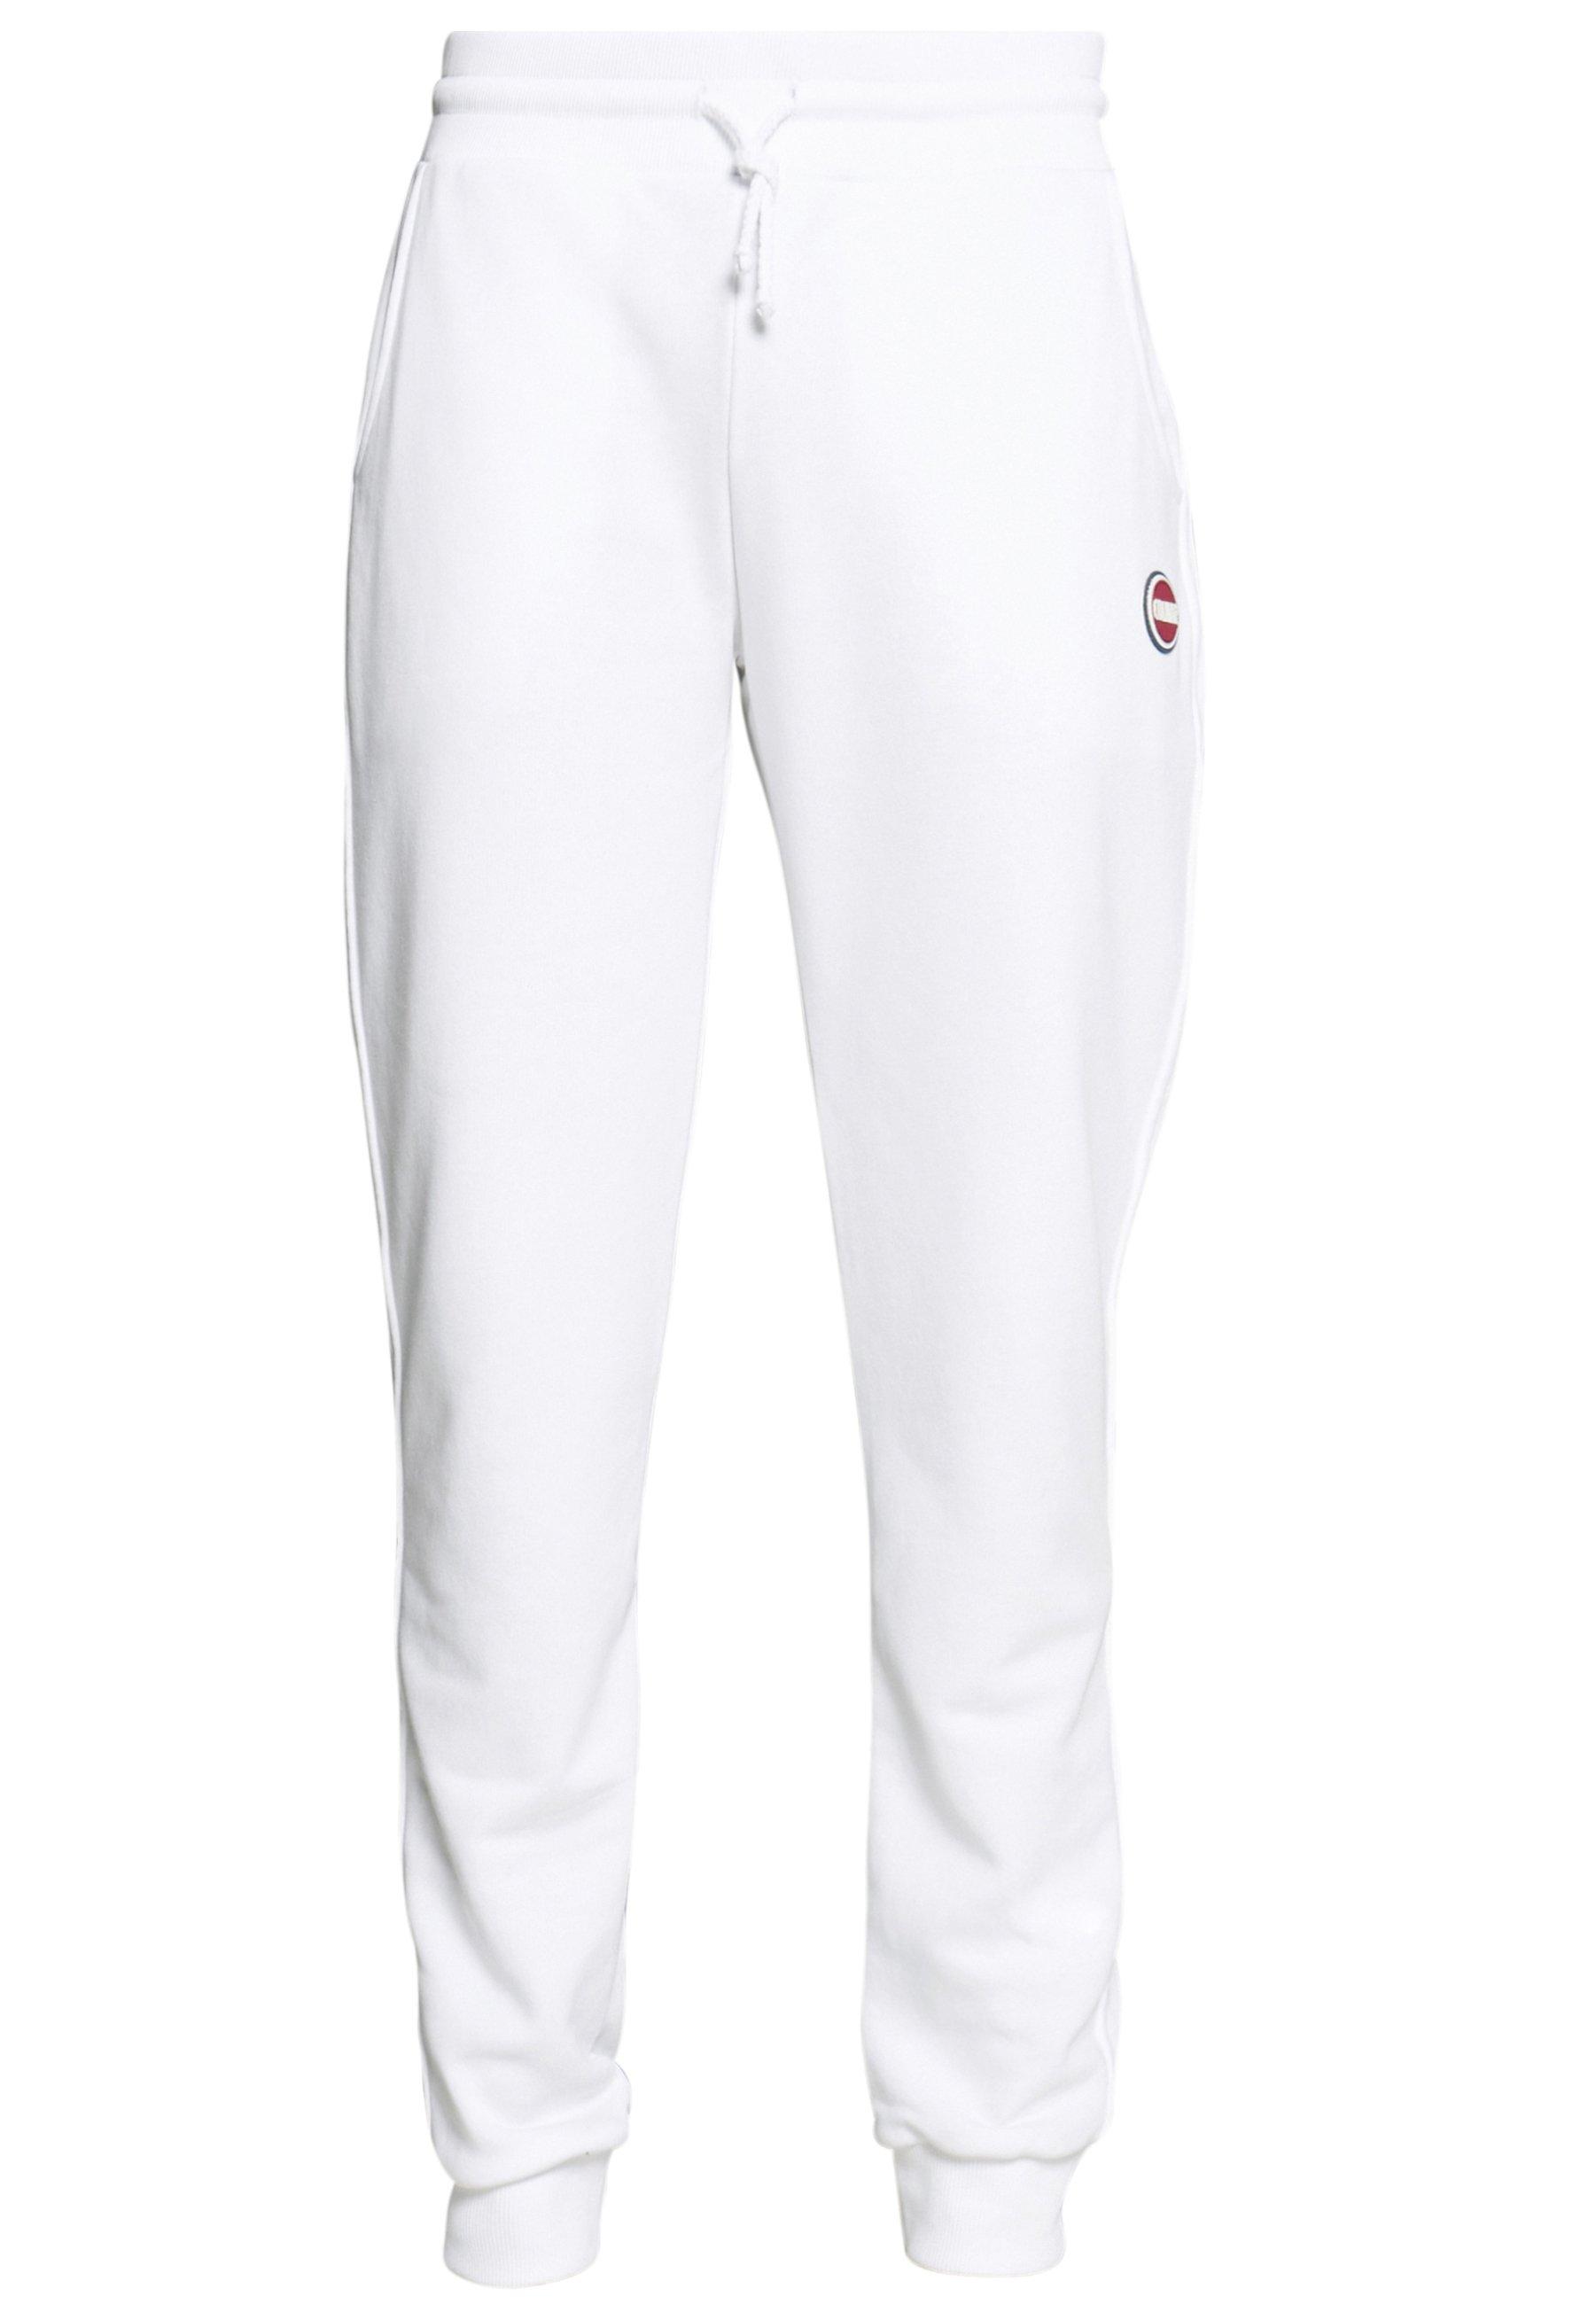 Colmar Originals Mens Pants - Träningsbyxor White